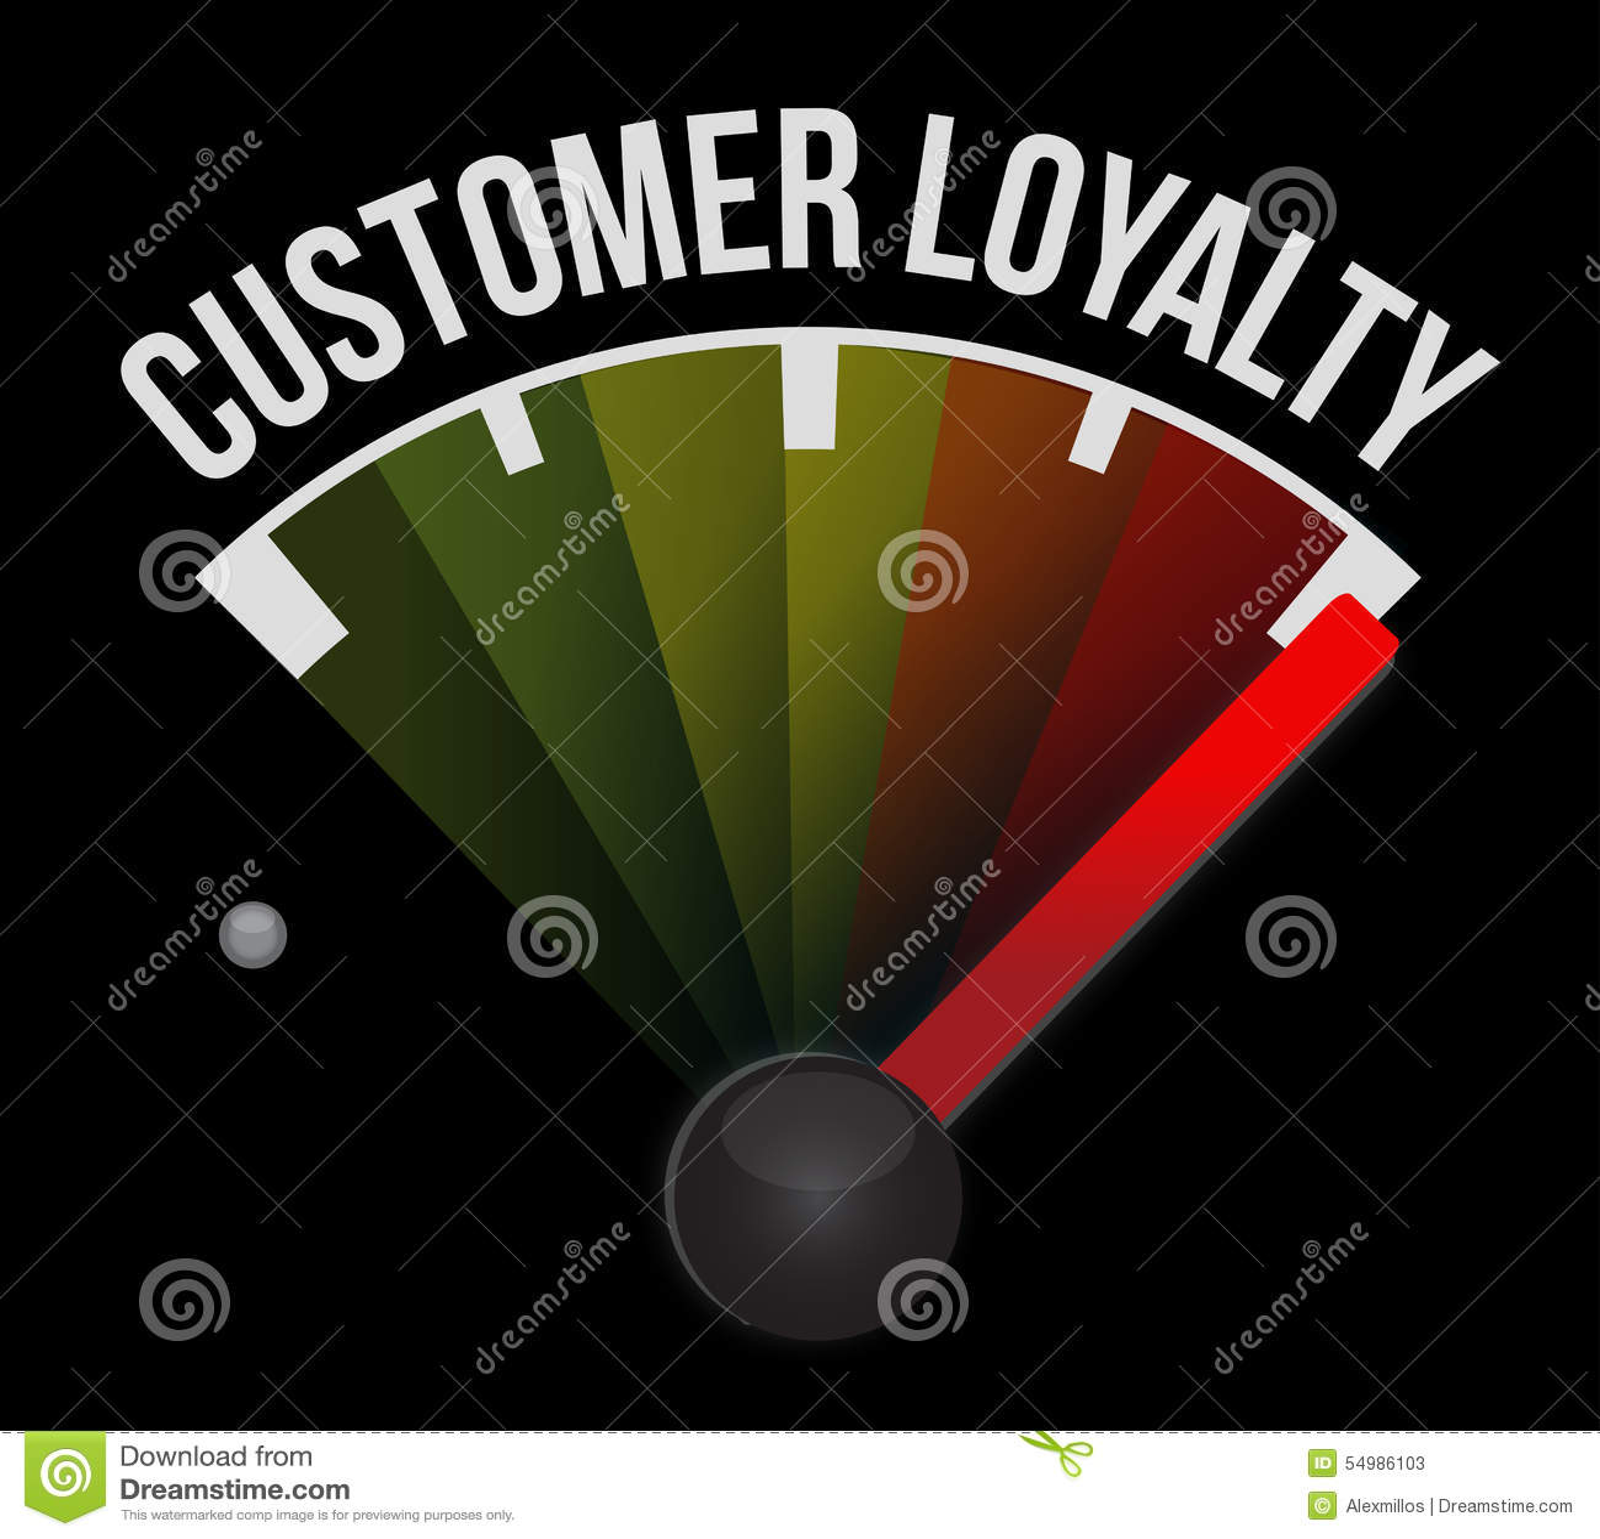 Kundenloyalitätsniveau-Zeichenkonzept